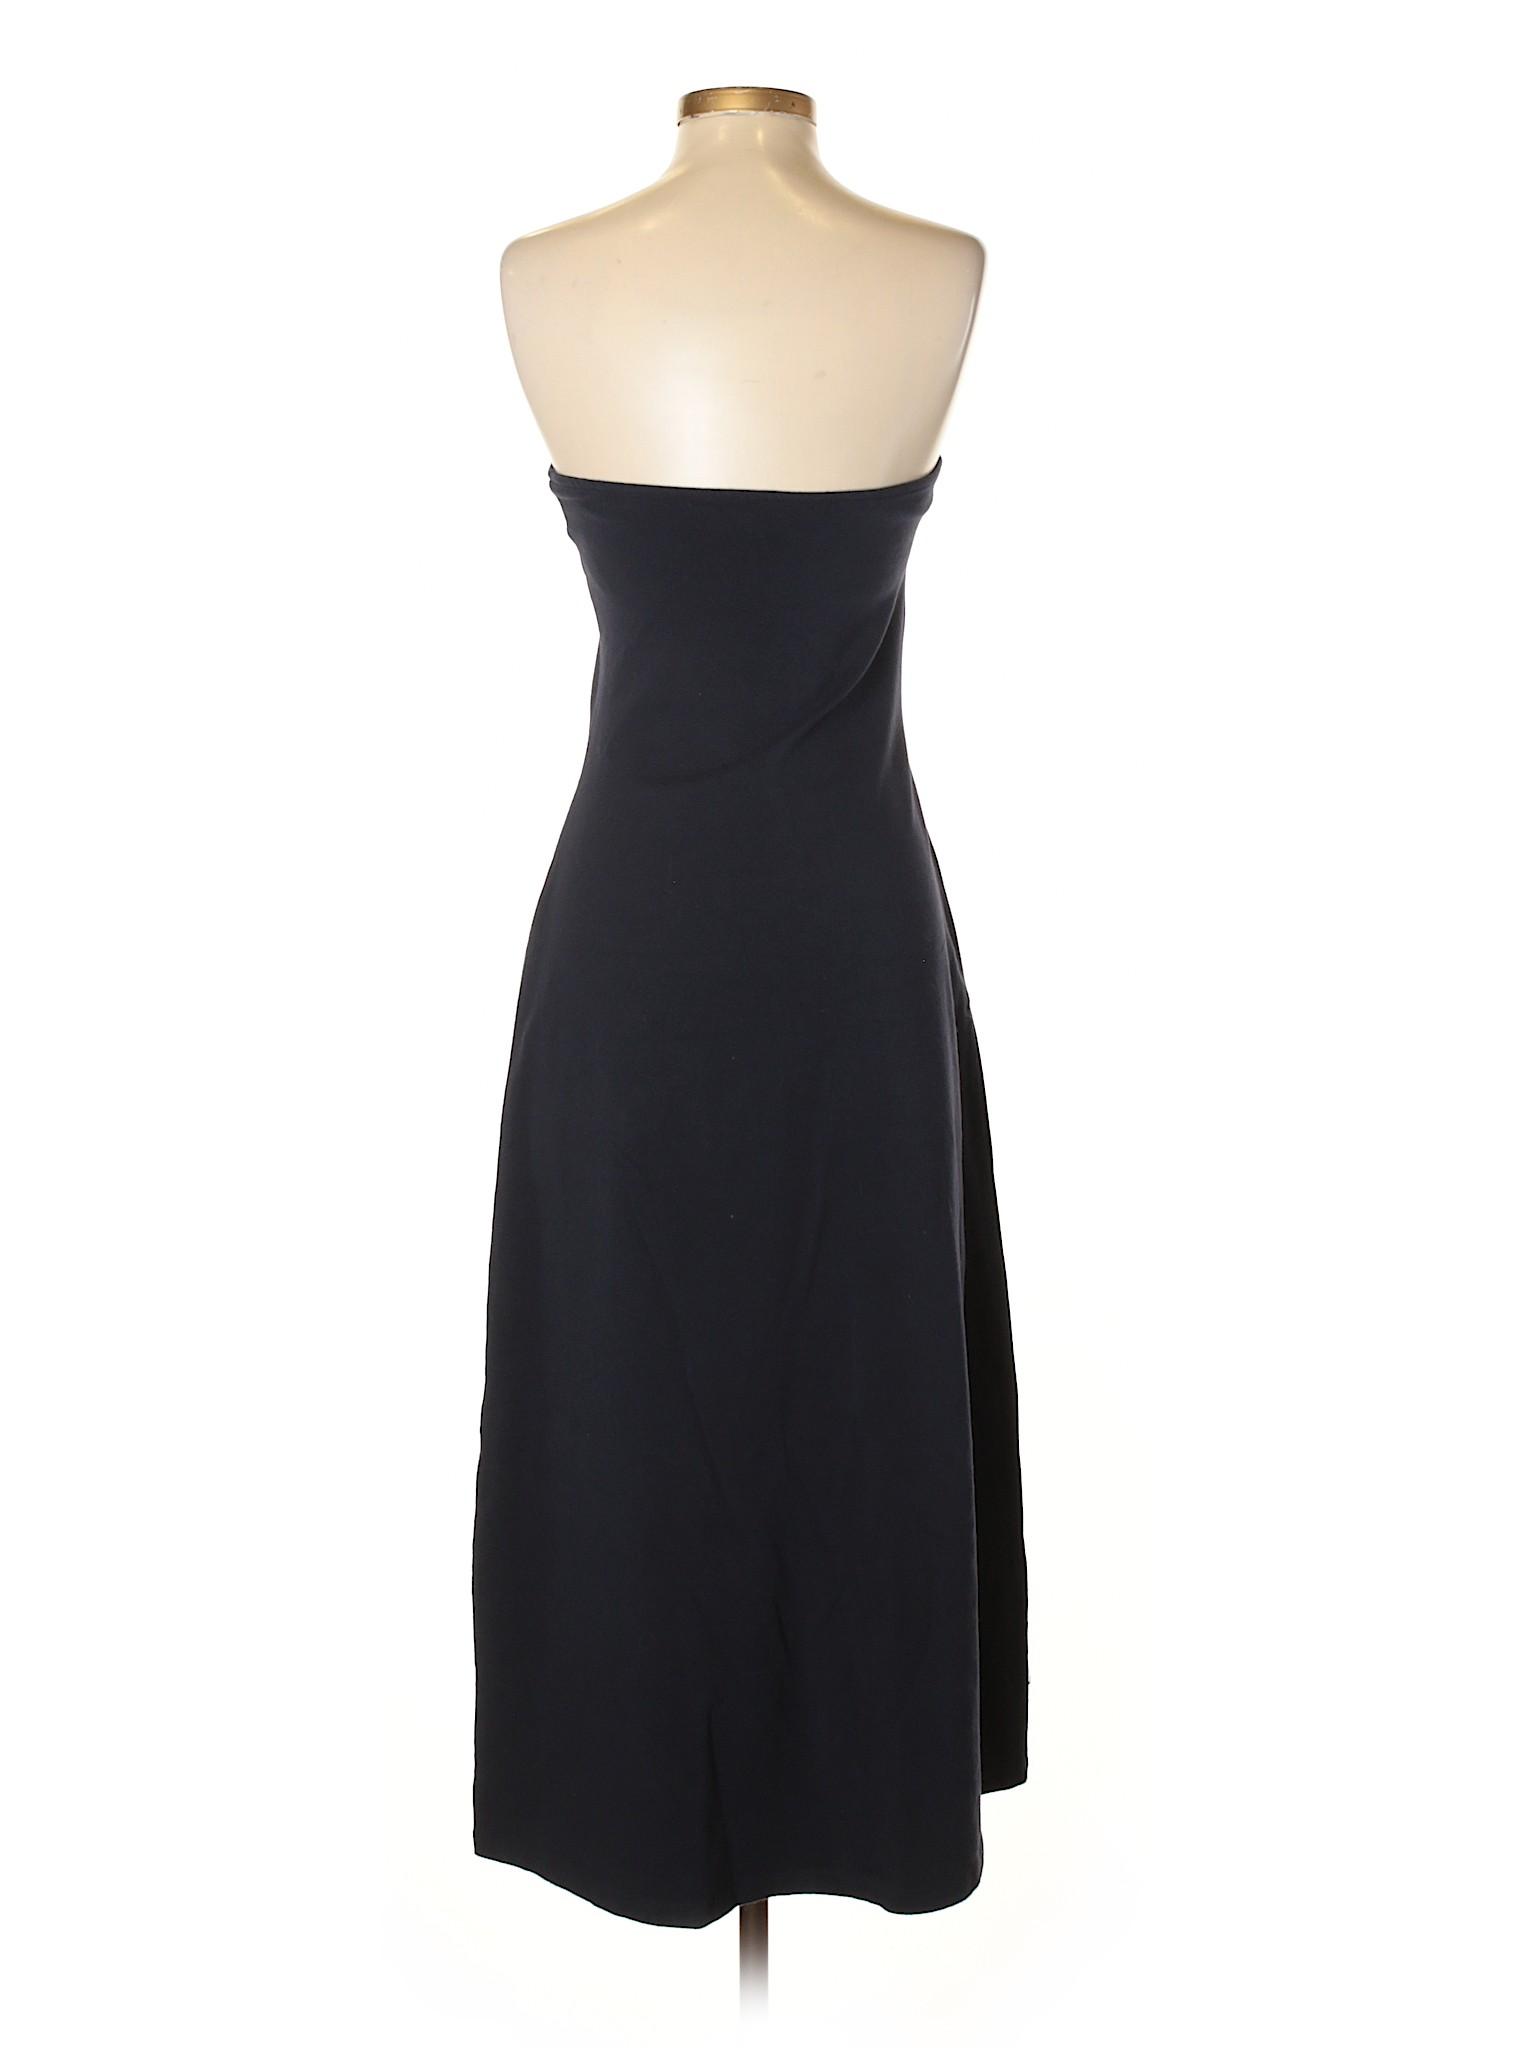 International Selling Casual Dress Moda Moda Selling Tffg14tn